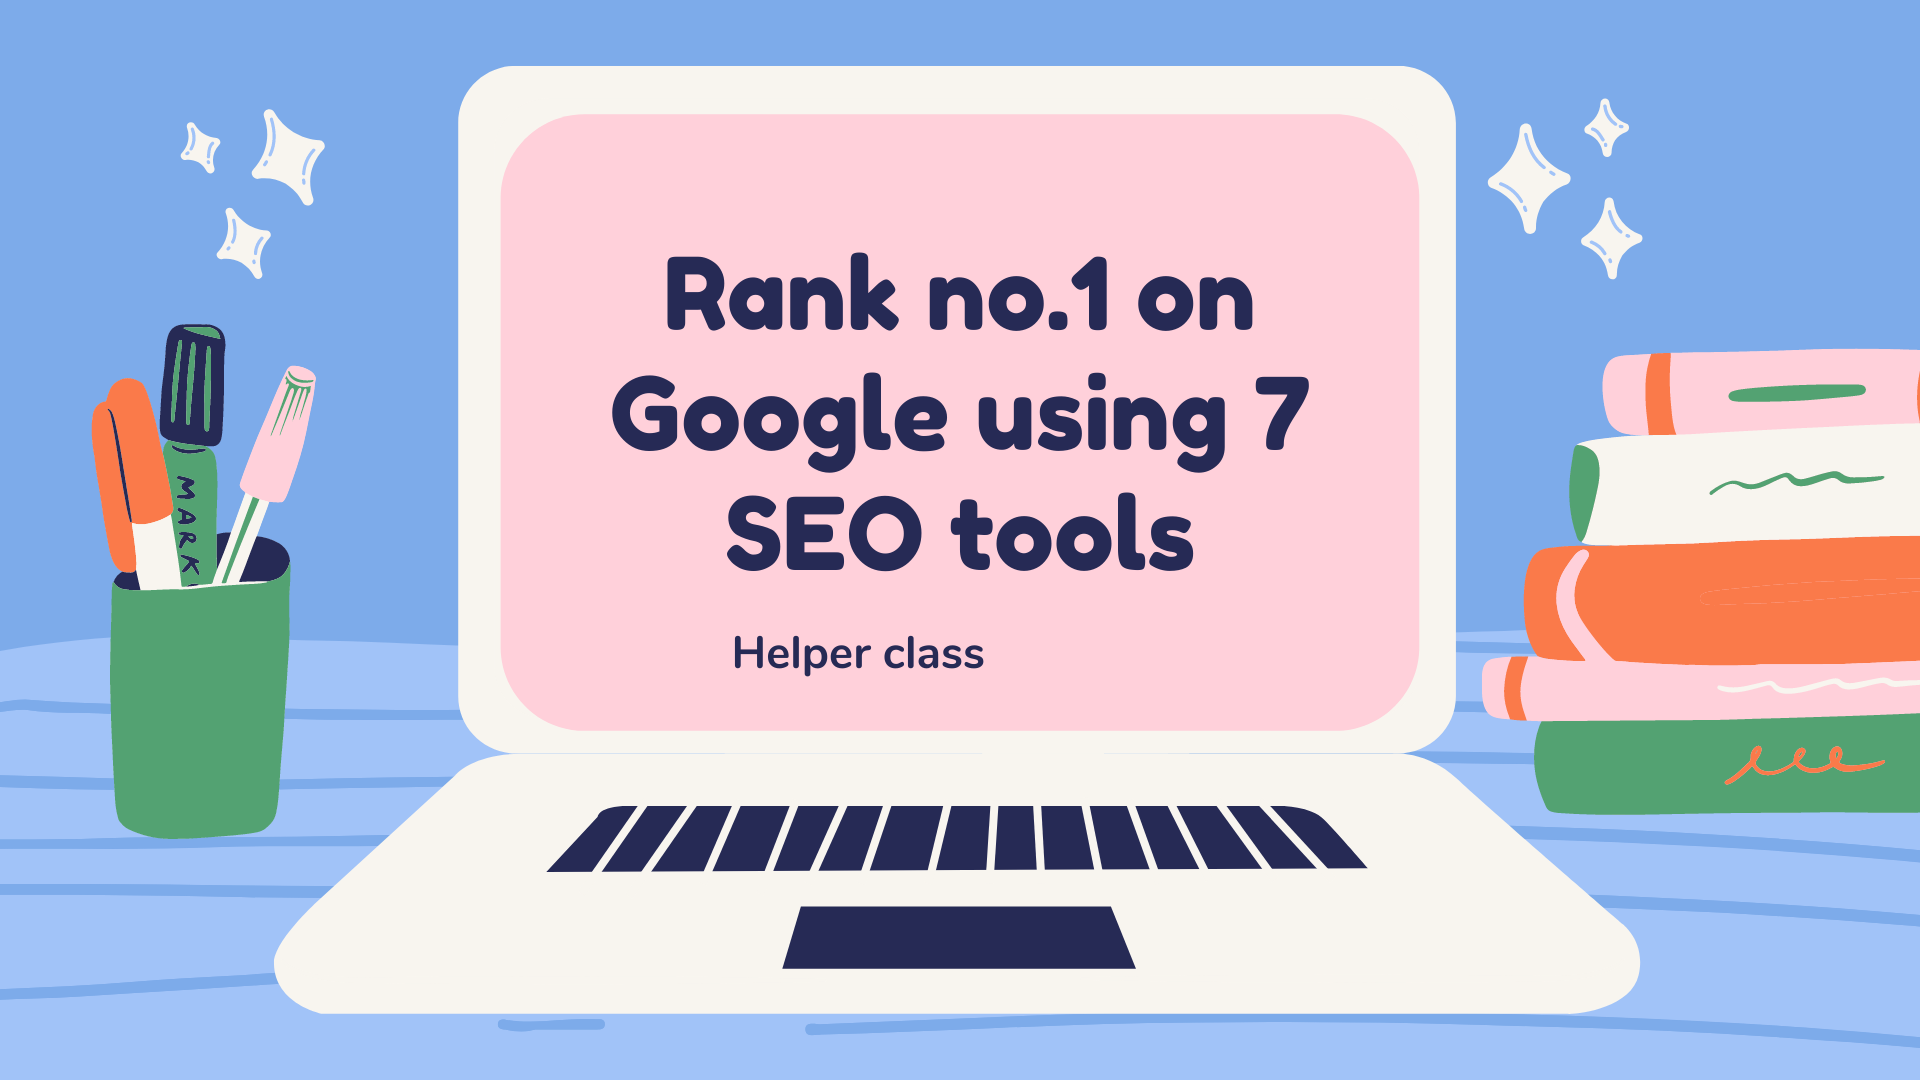 Rank no. 1 on Google using free 7 SEO tools